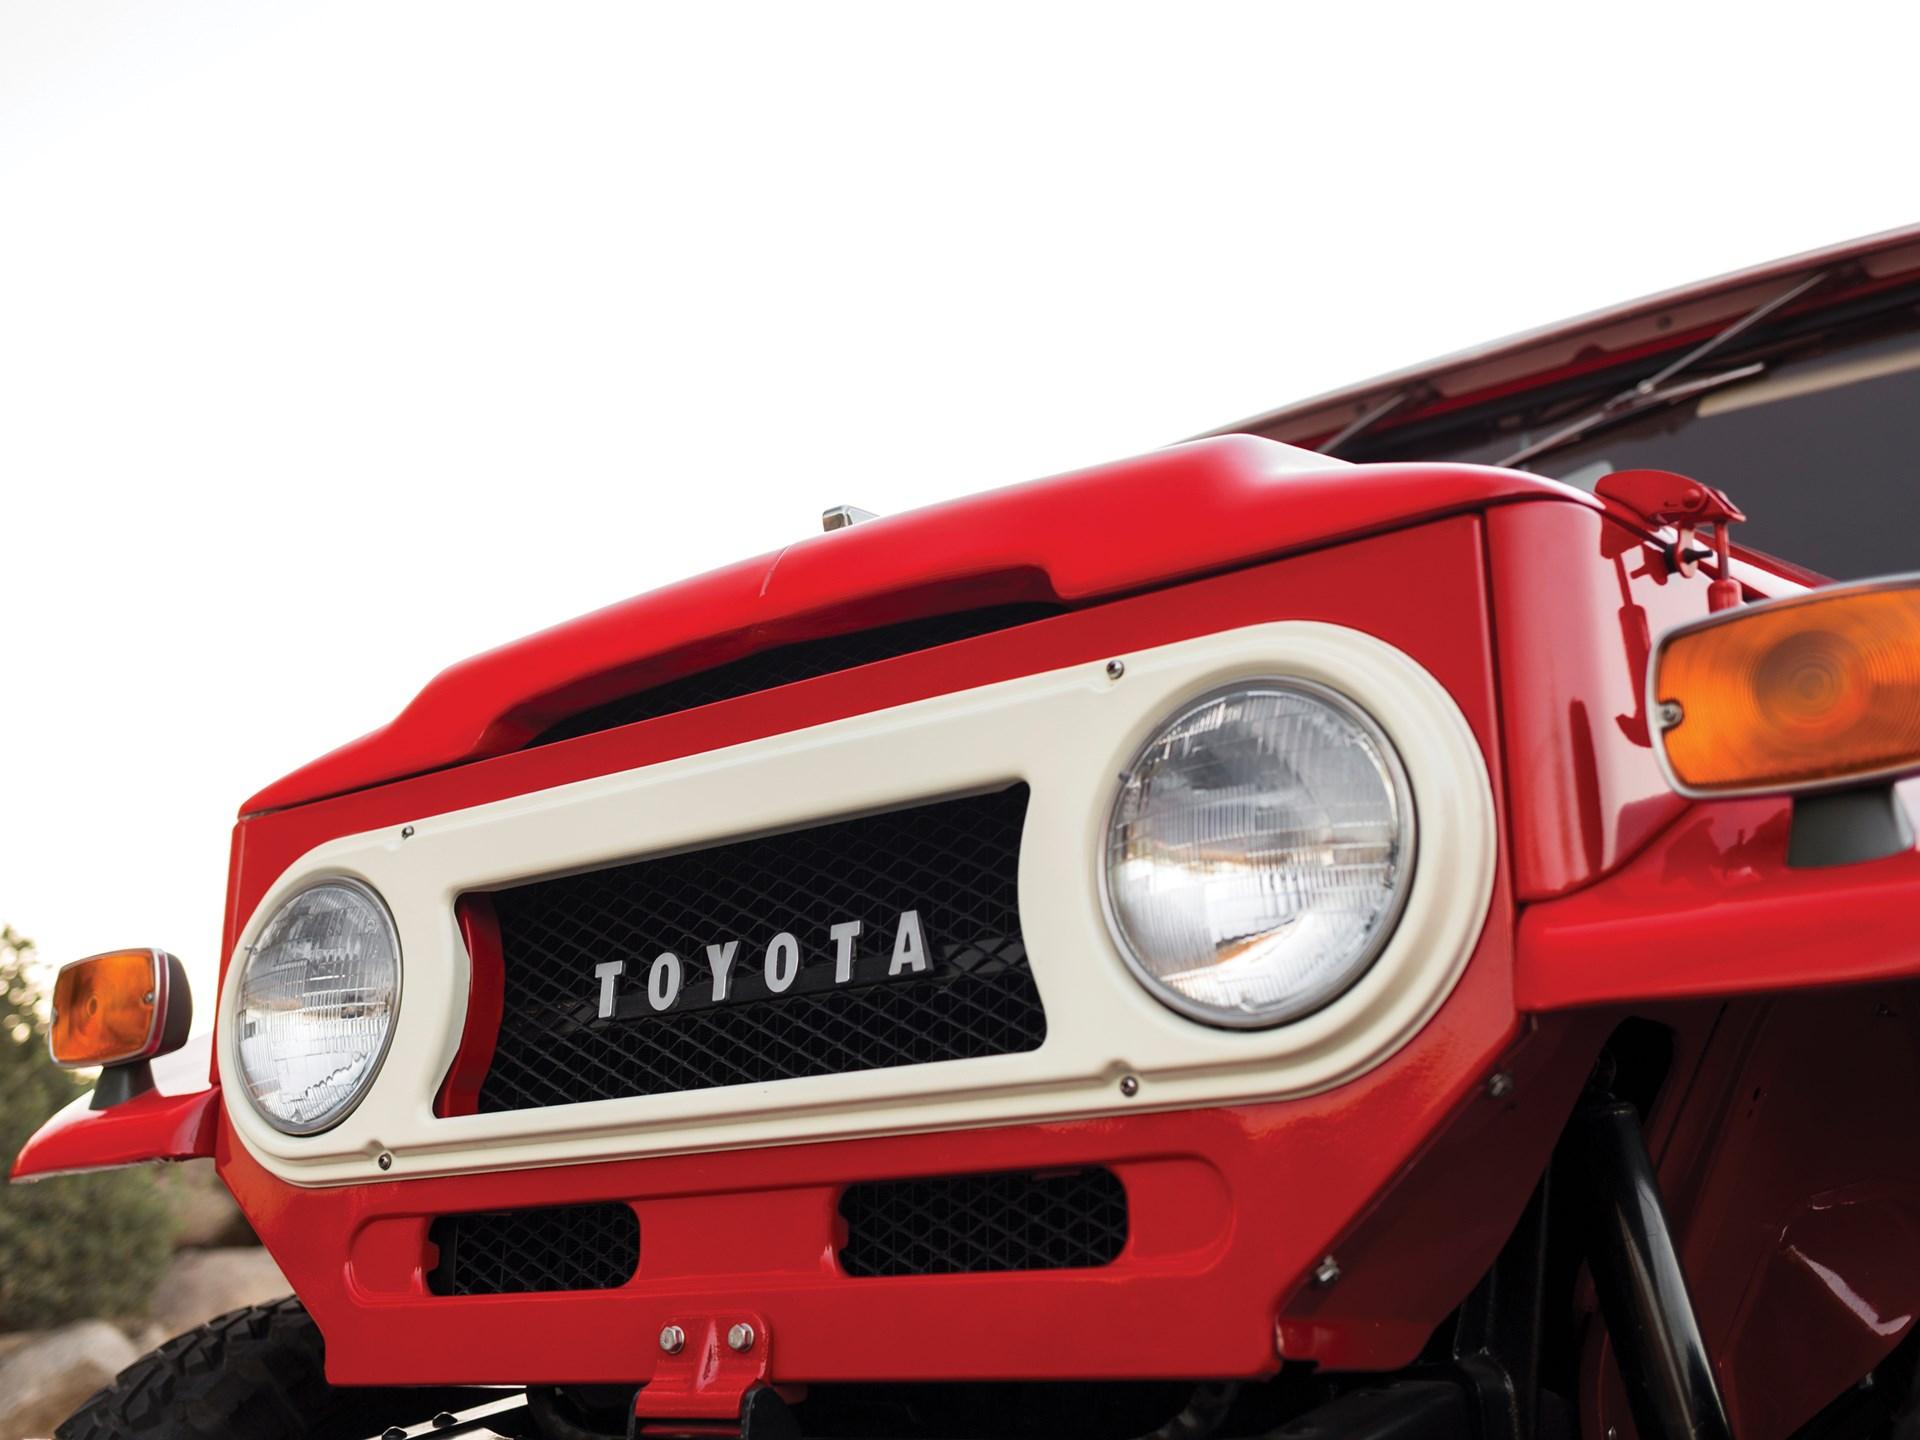 1970 Toyota FJ40 Land Cruiser